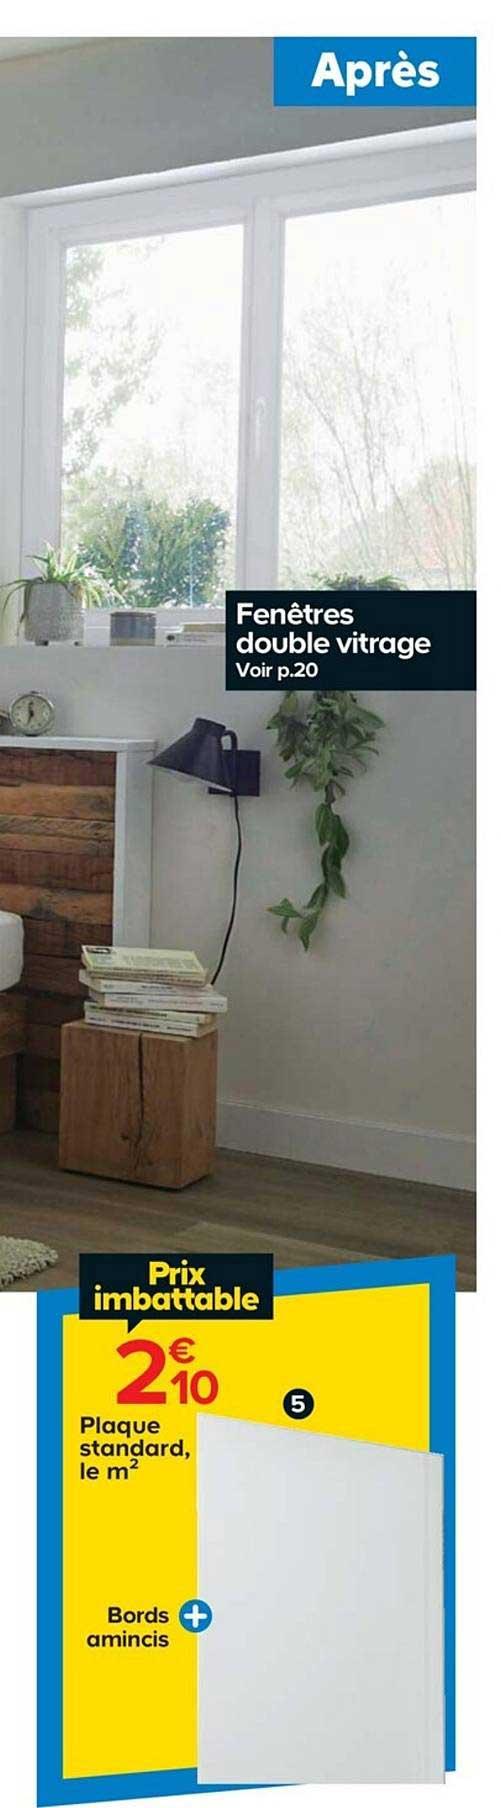 Offre Fenetres Double Vitrage Chez Castorama